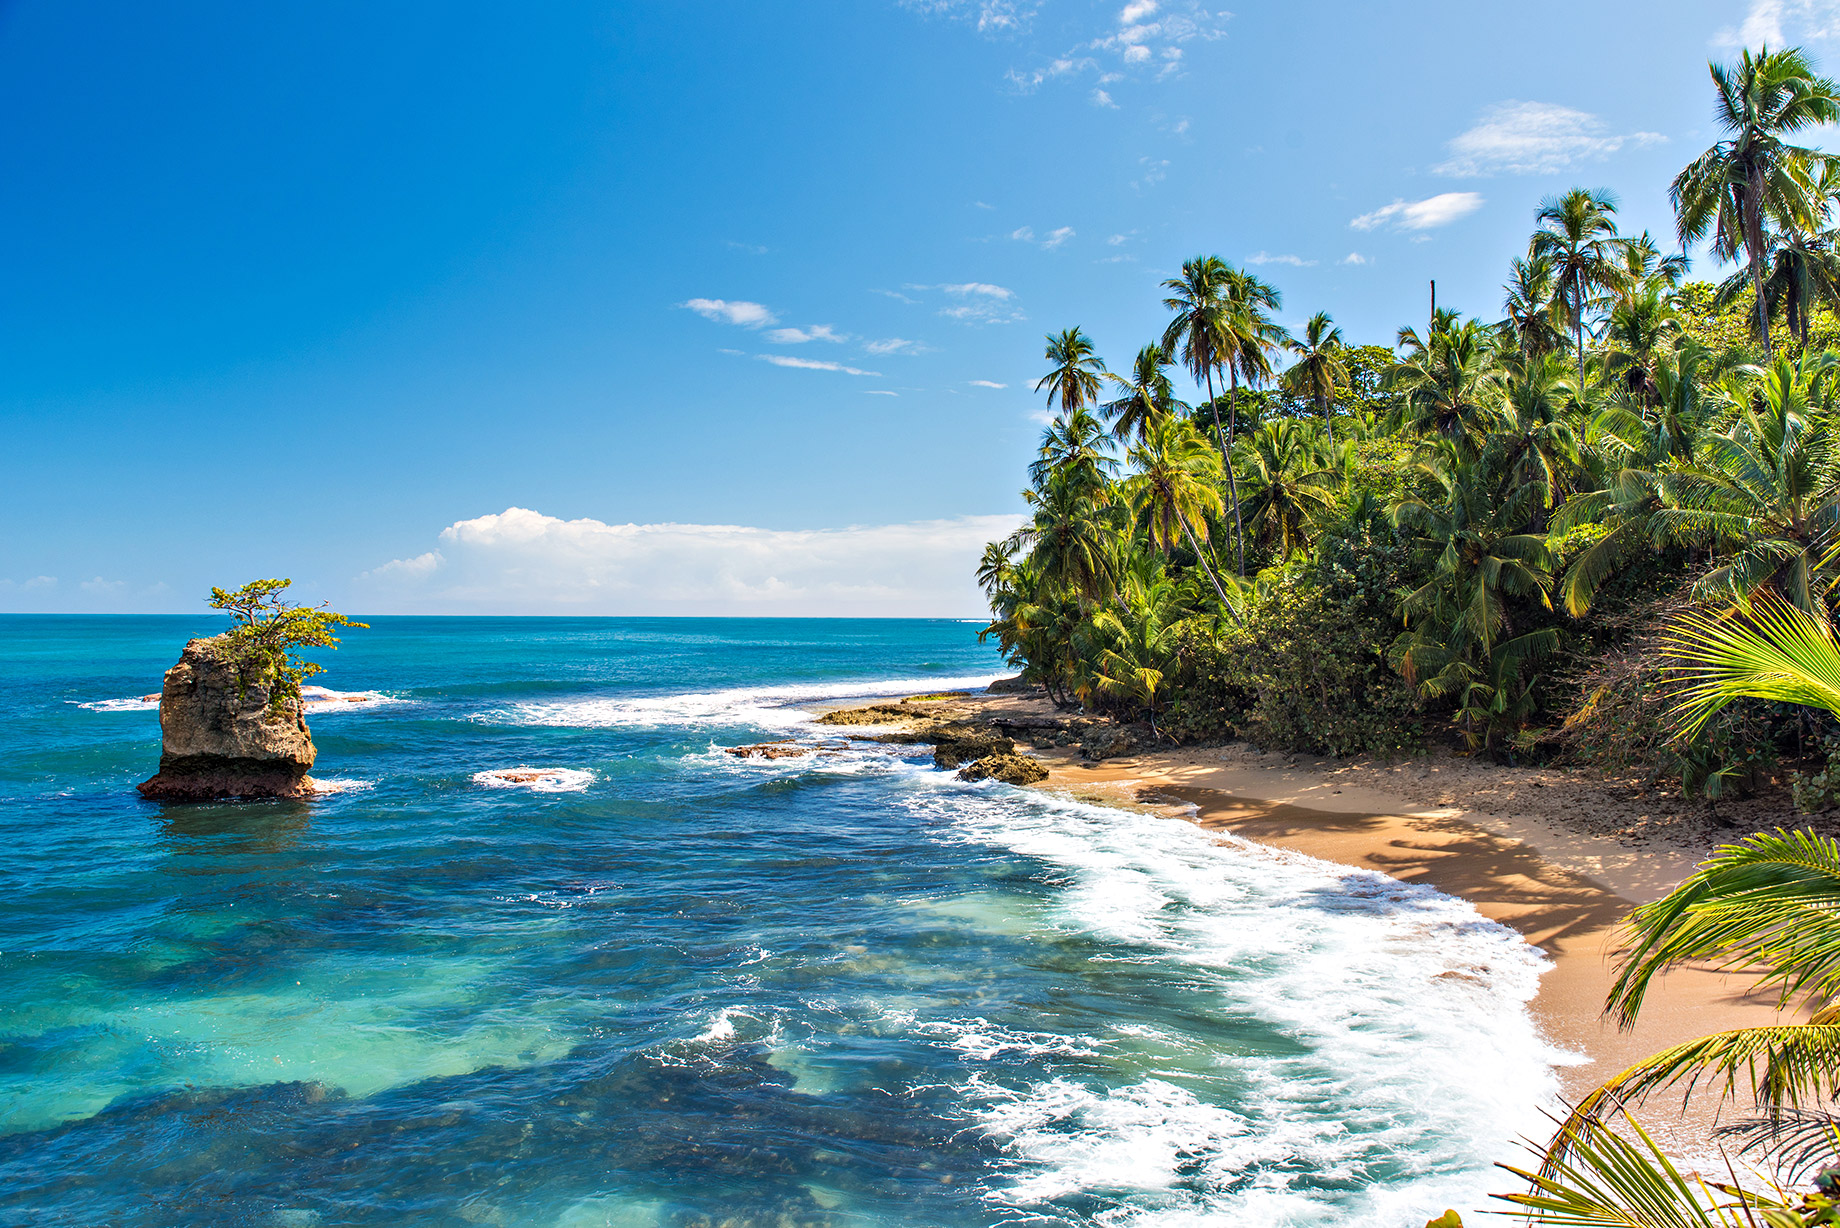 Wild Caribbean Beach of Manzanillo - Puerto Viejo, Costa Rica - Top 10 Luxury Travel Destinations Around the World